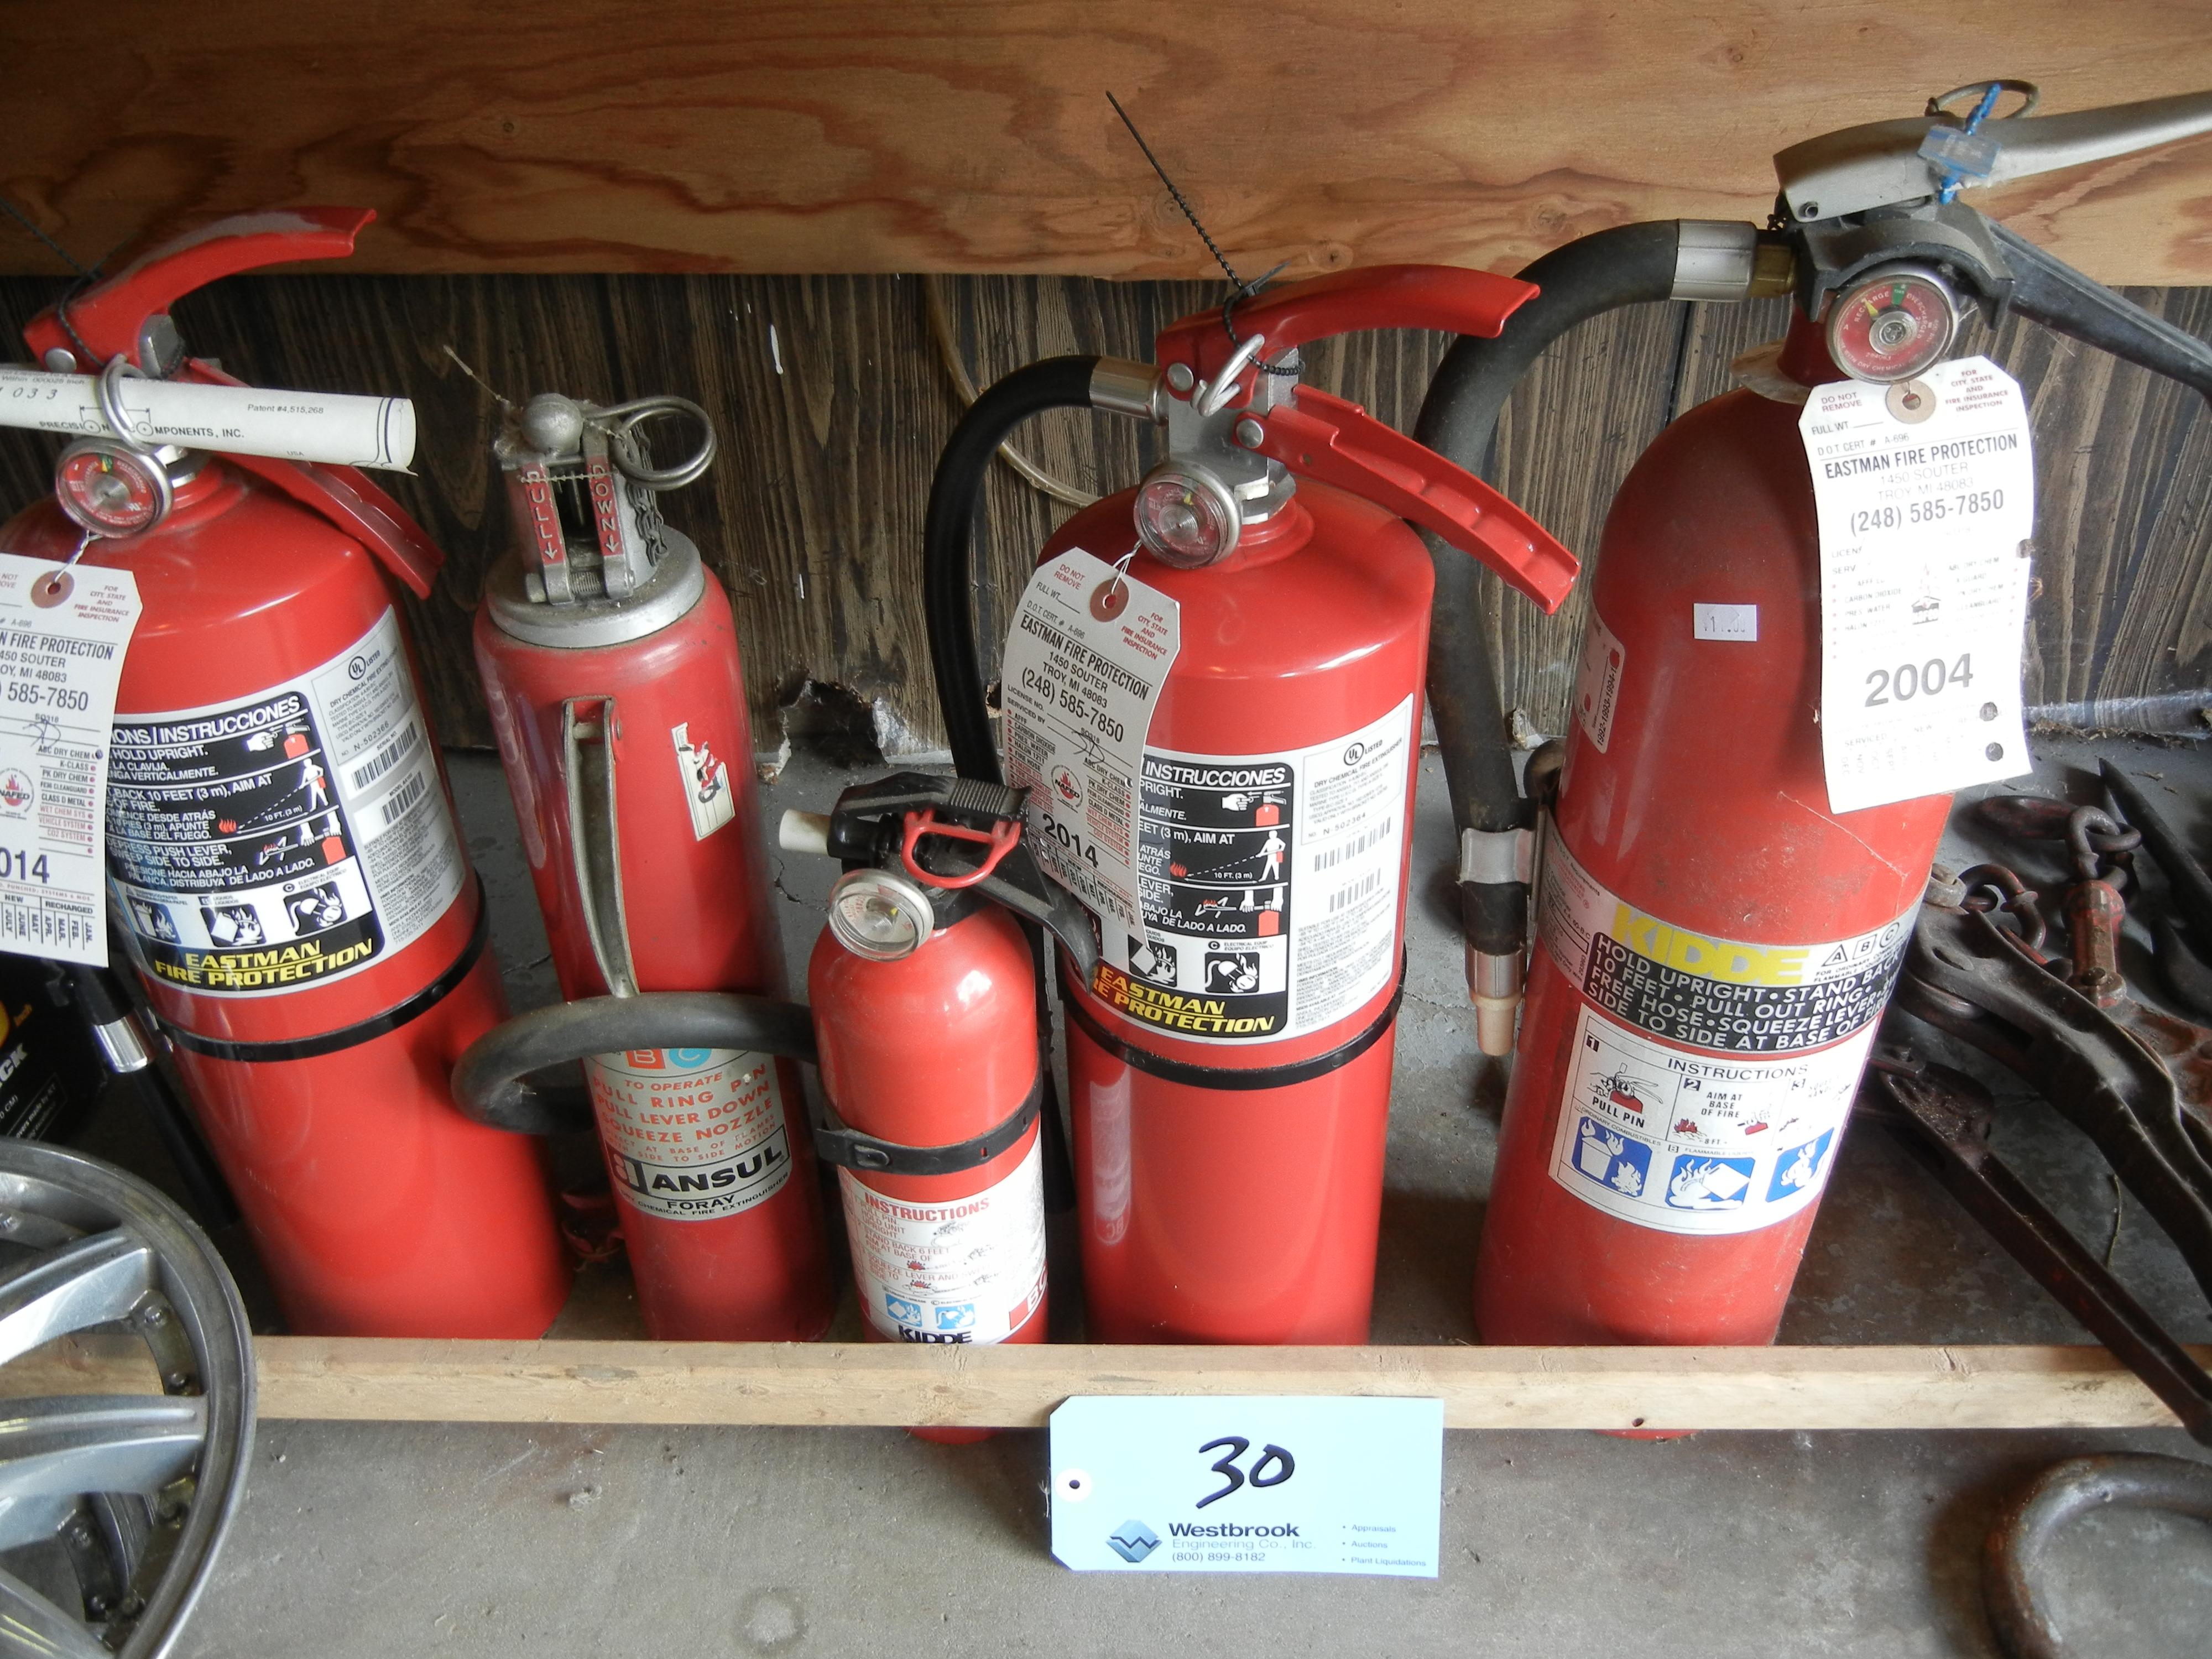 Five fire exhaushiers